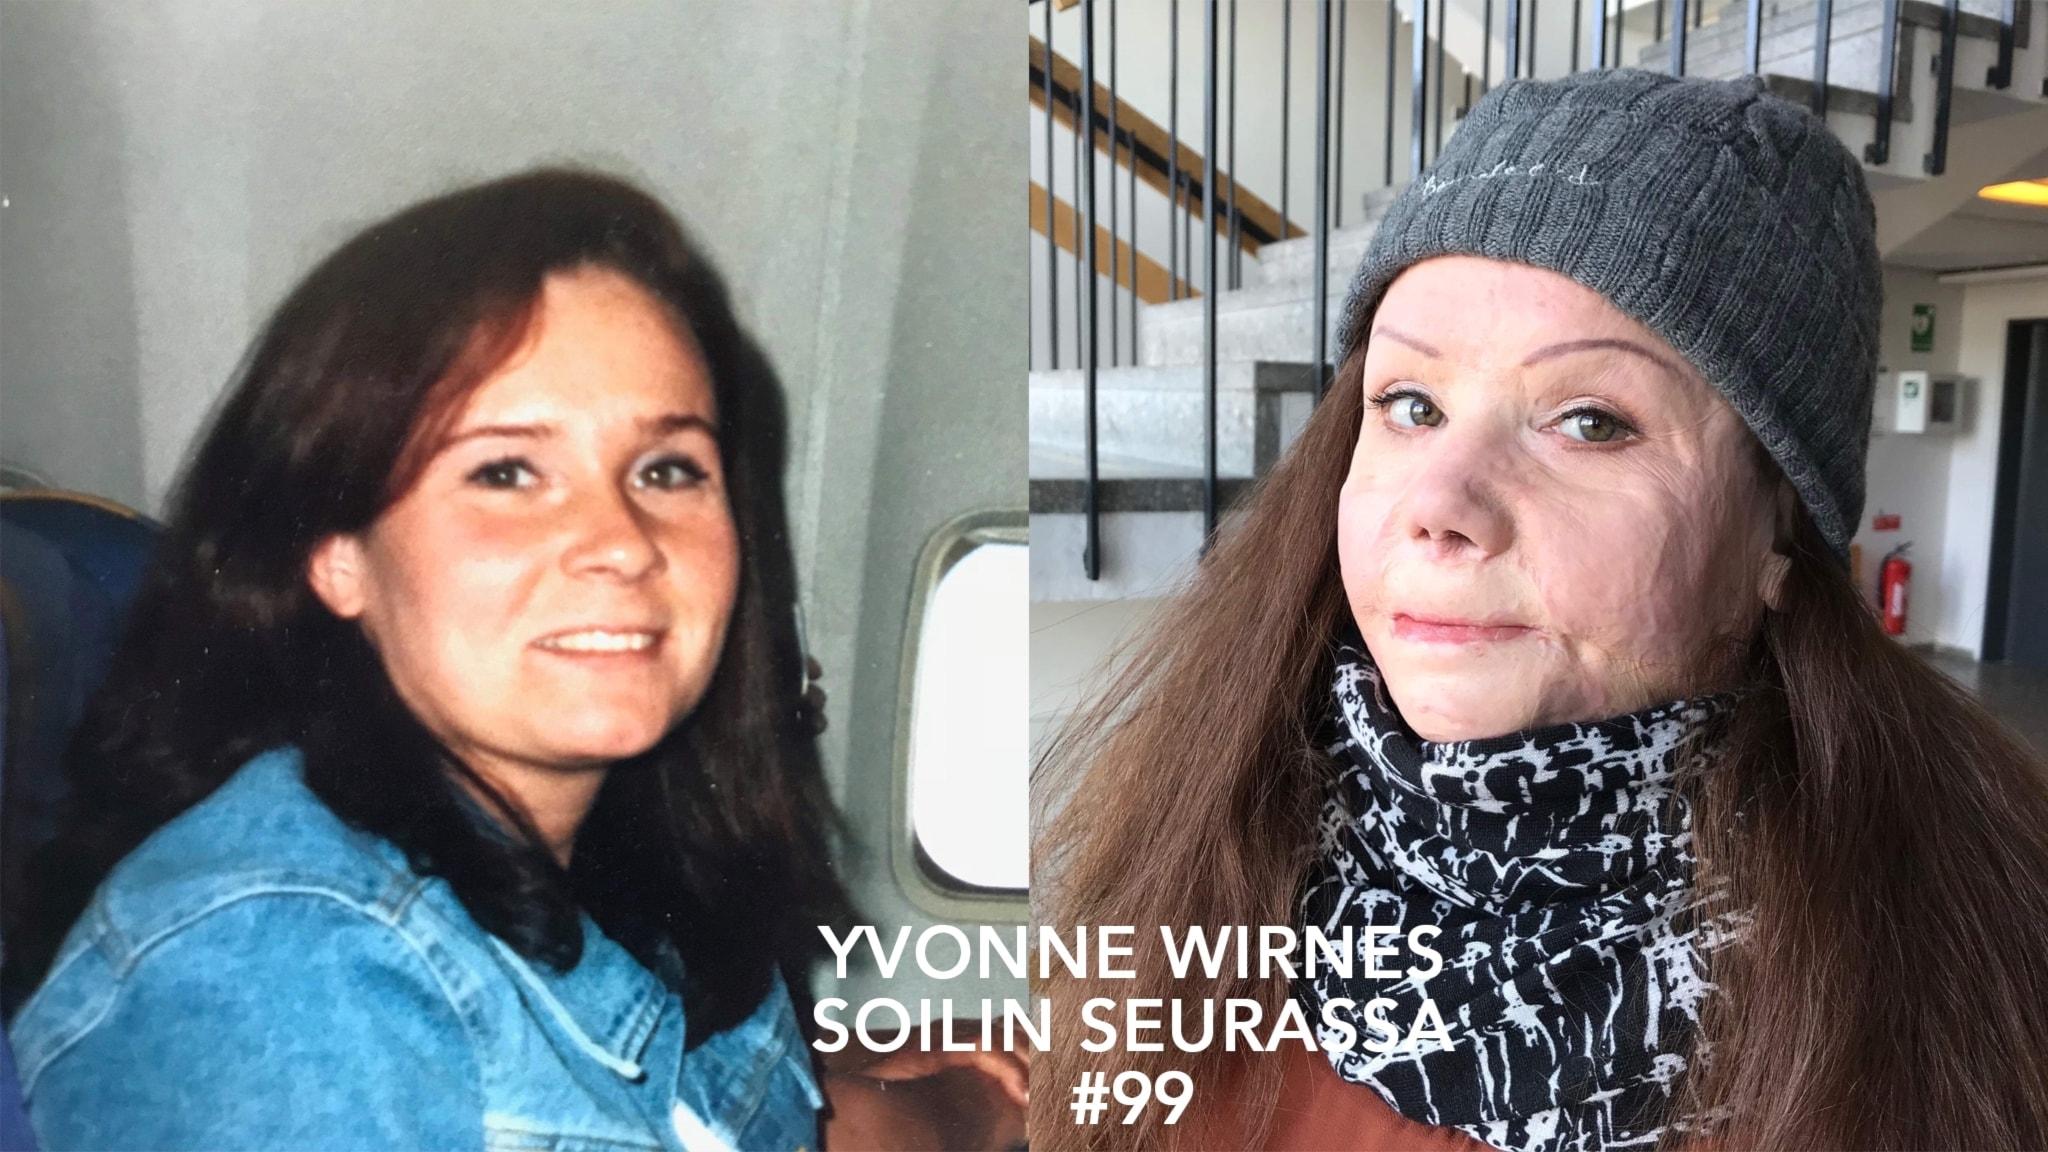 Yvonne Wirnes